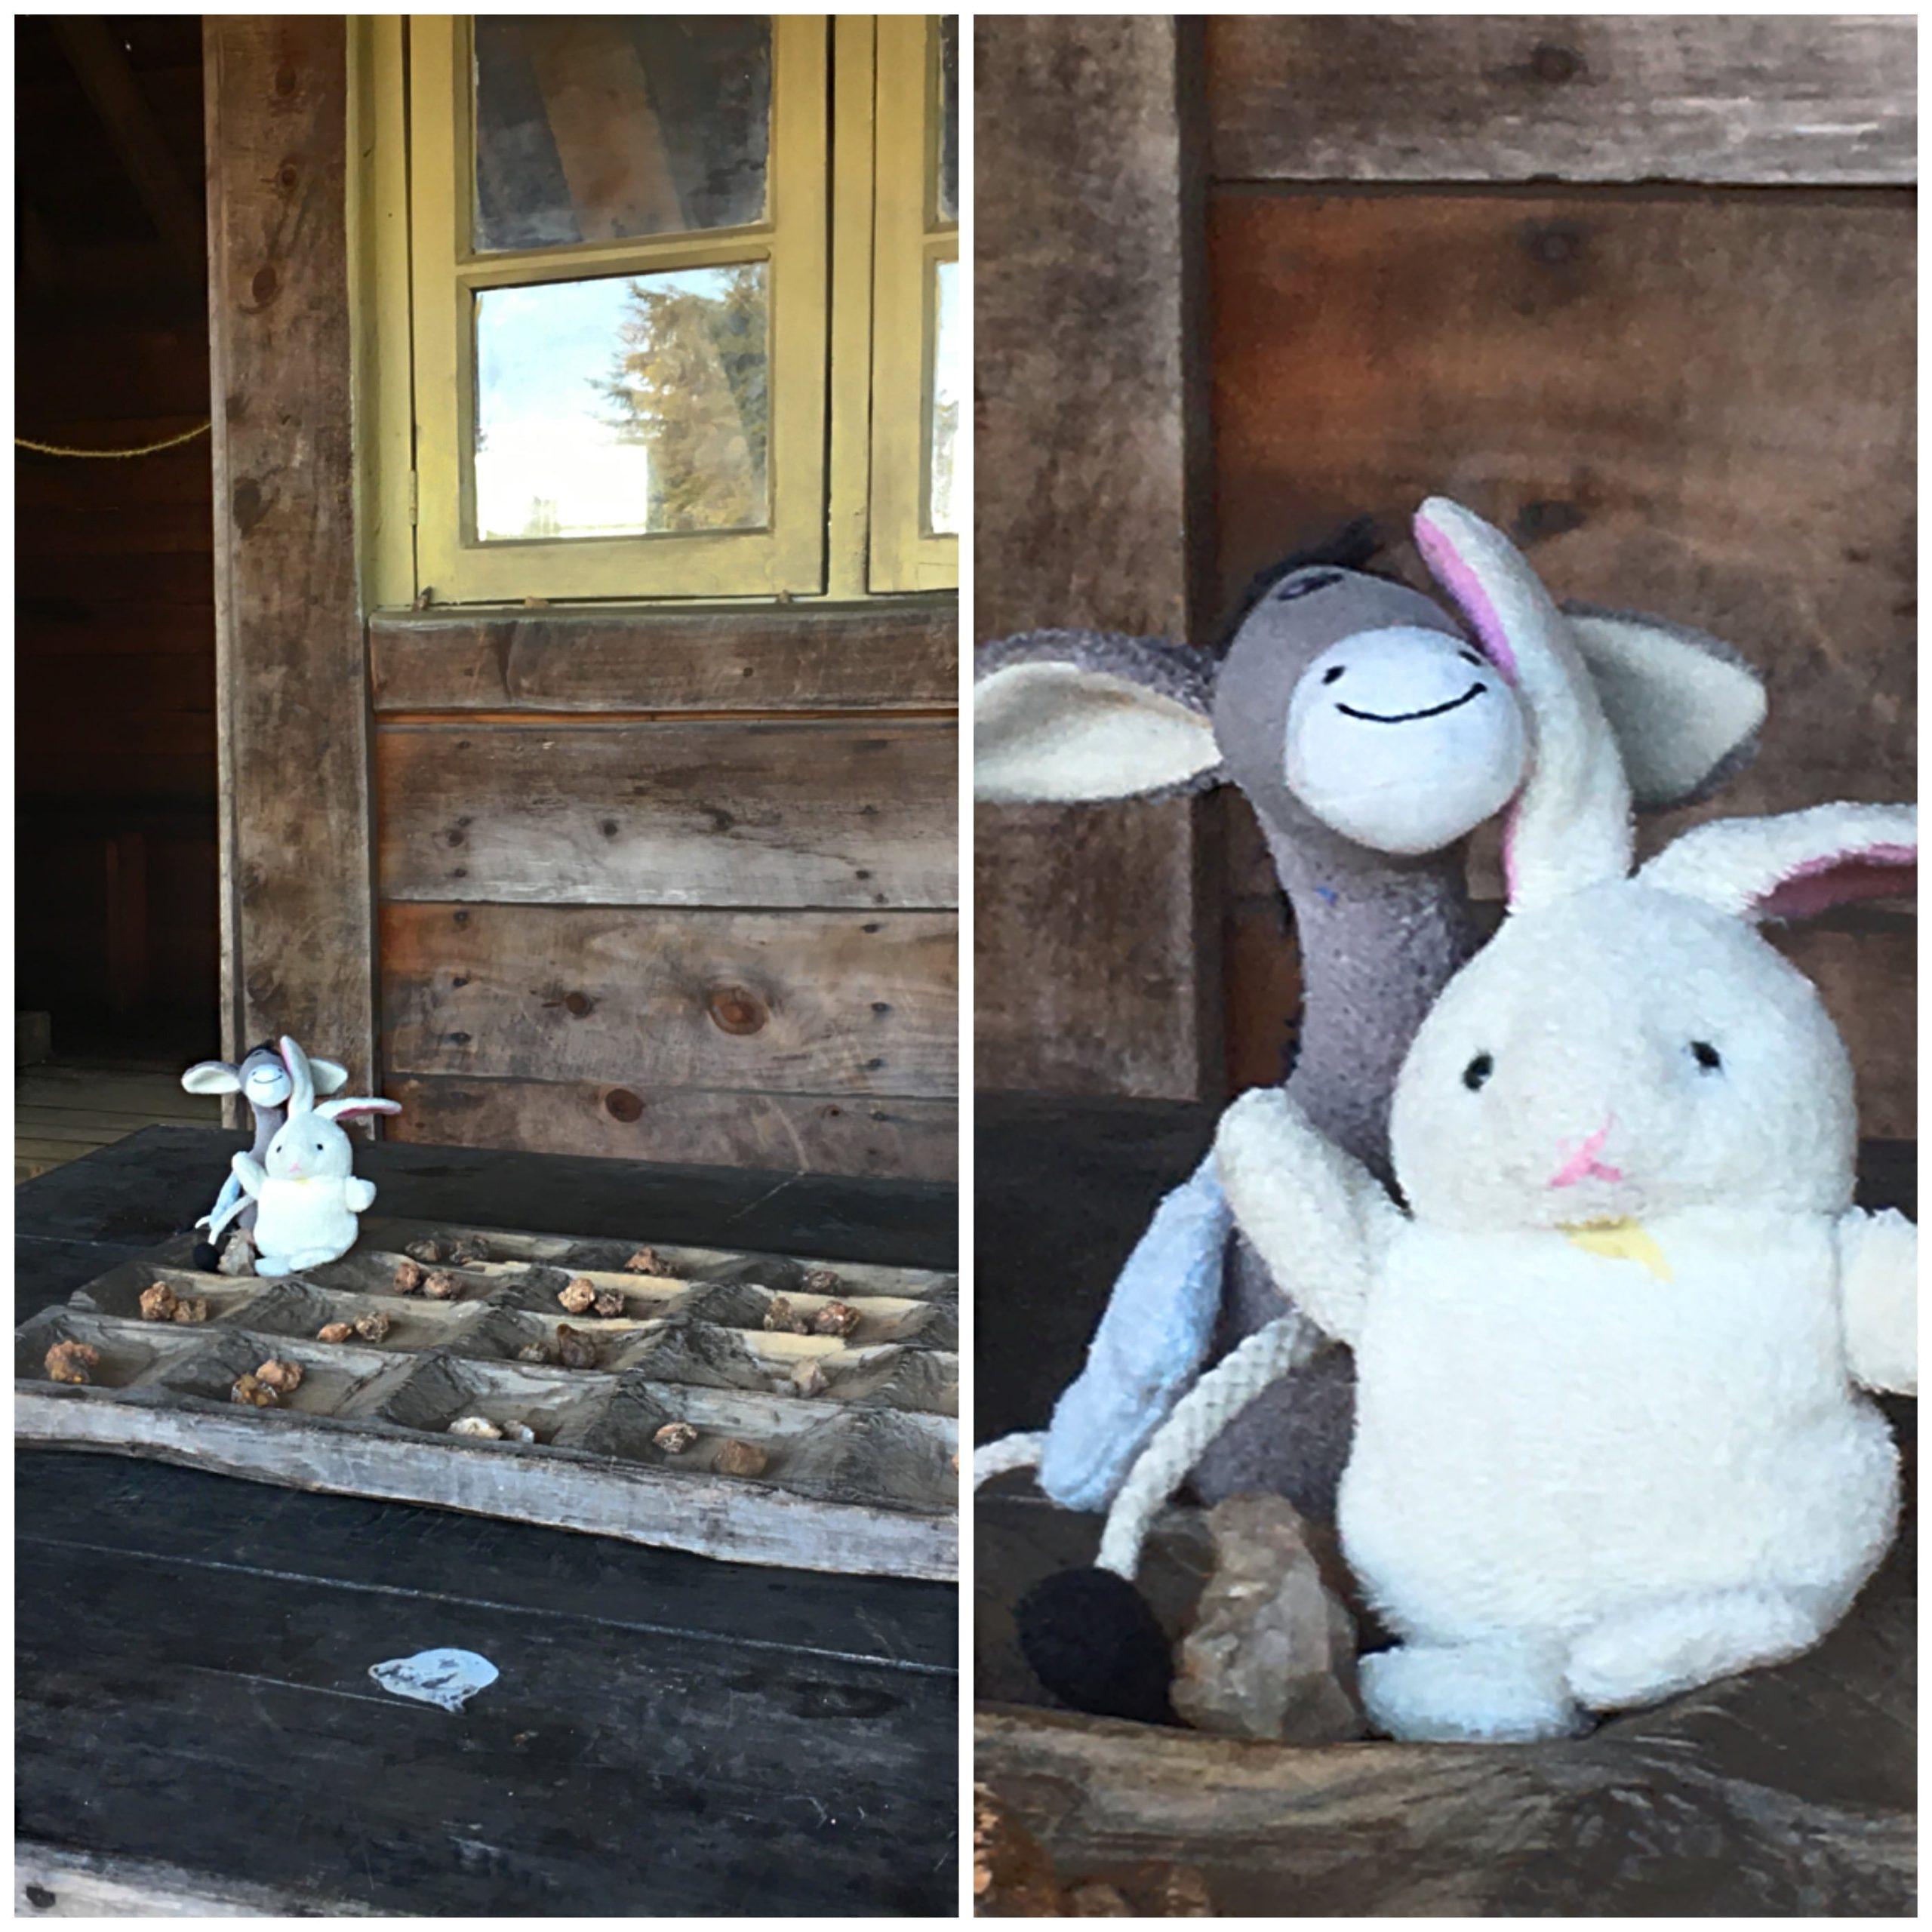 Donkey-and-Rabbit-at-home